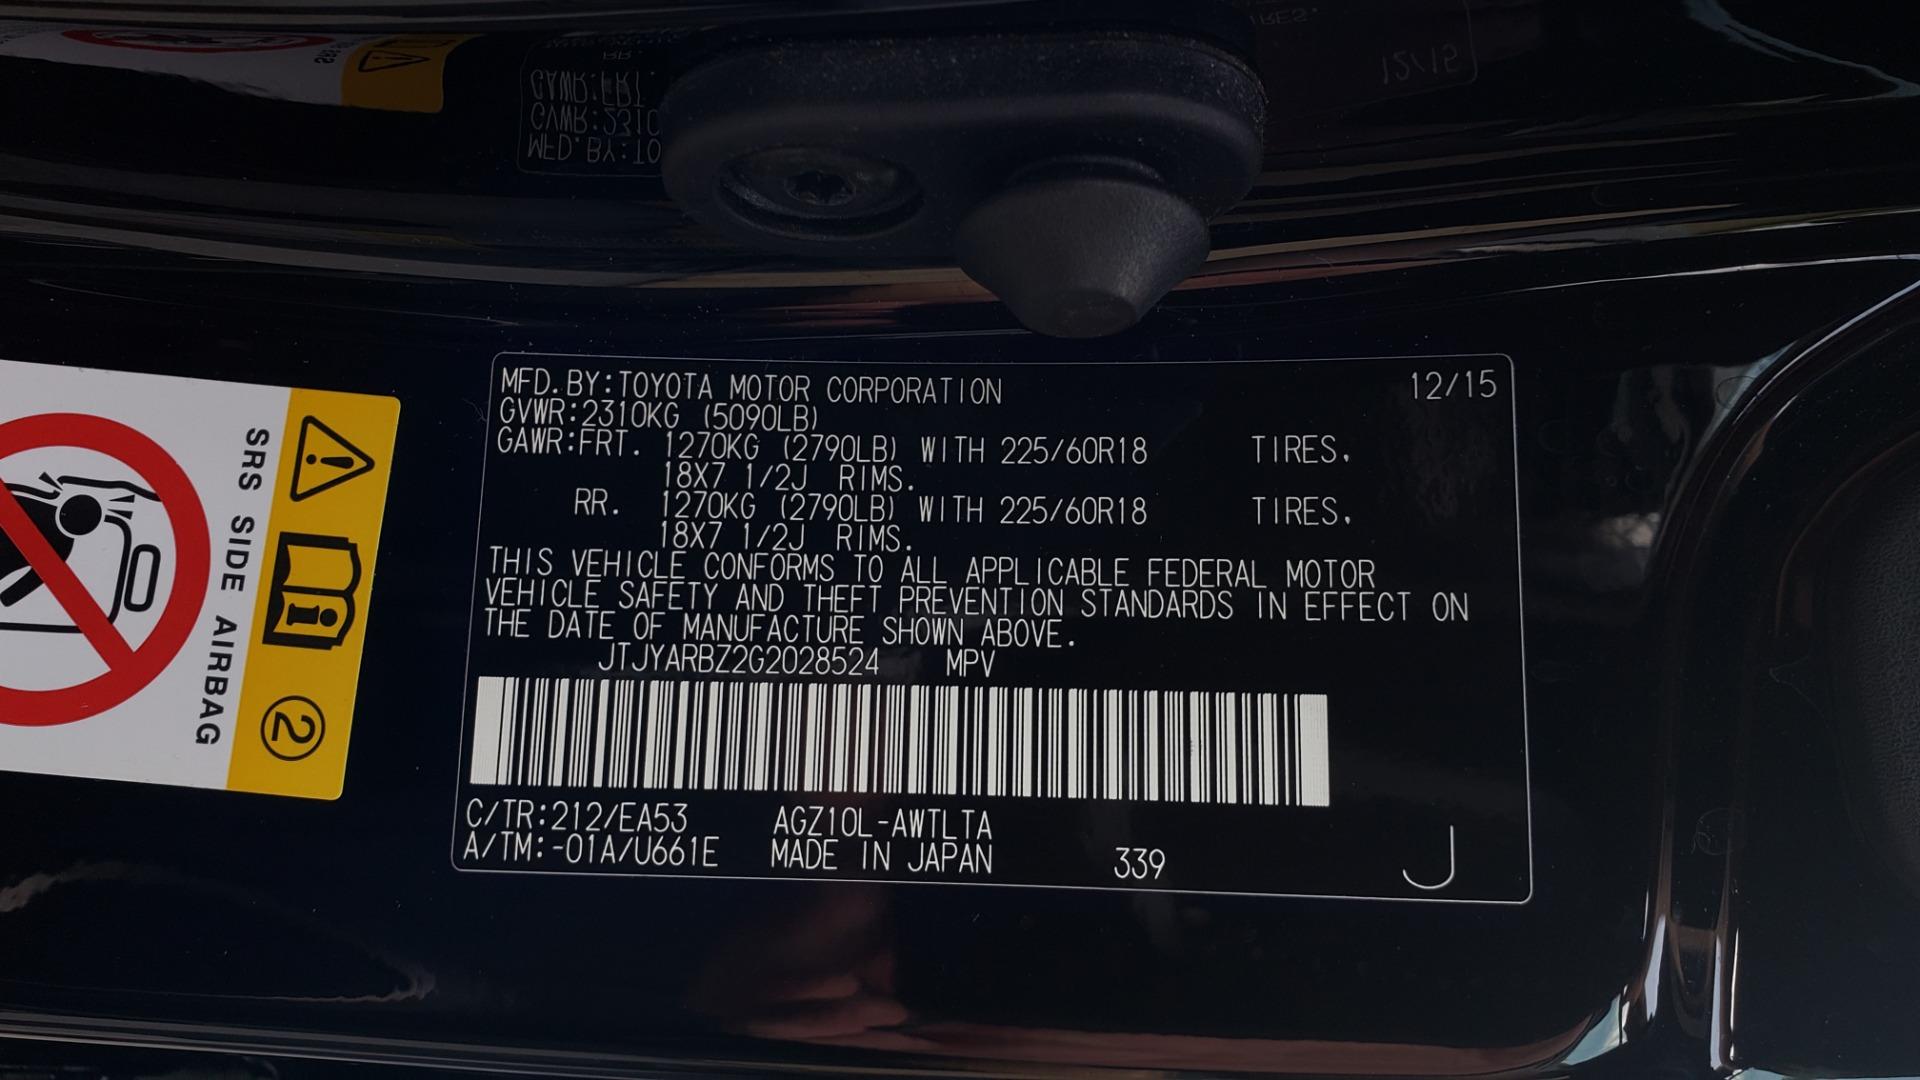 Used 2016 Lexus NX 200T PREM PKG / NAV / SUNROOF / PRE-COLLISION / PARK ASST for sale Sold at Formula Imports in Charlotte NC 28227 88